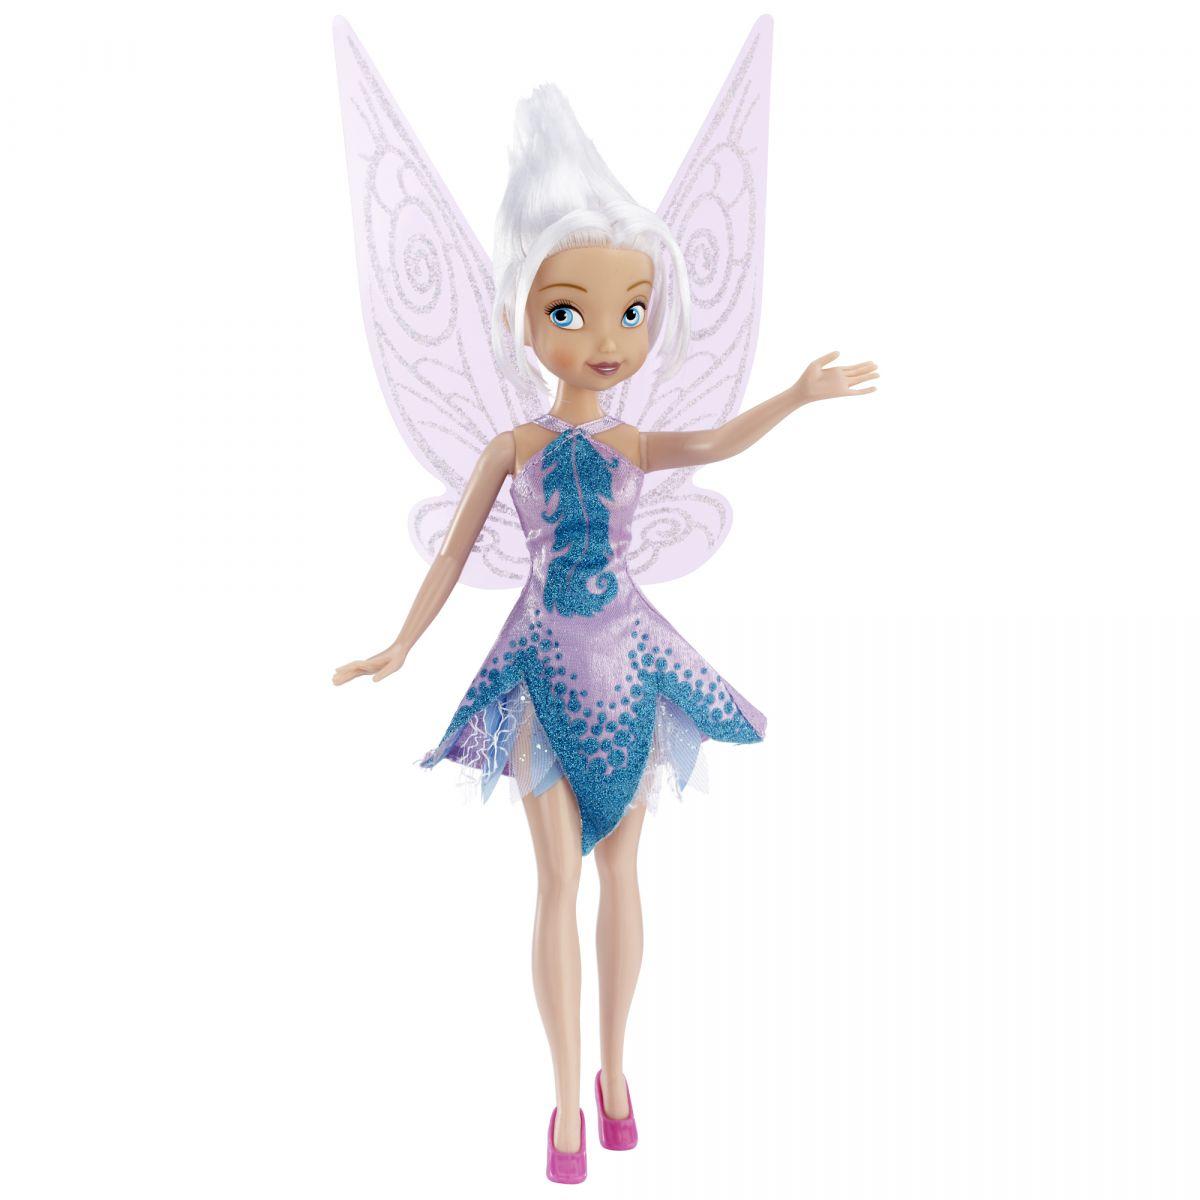 Disney Víly 22cm klasická panenka - Modrovločka